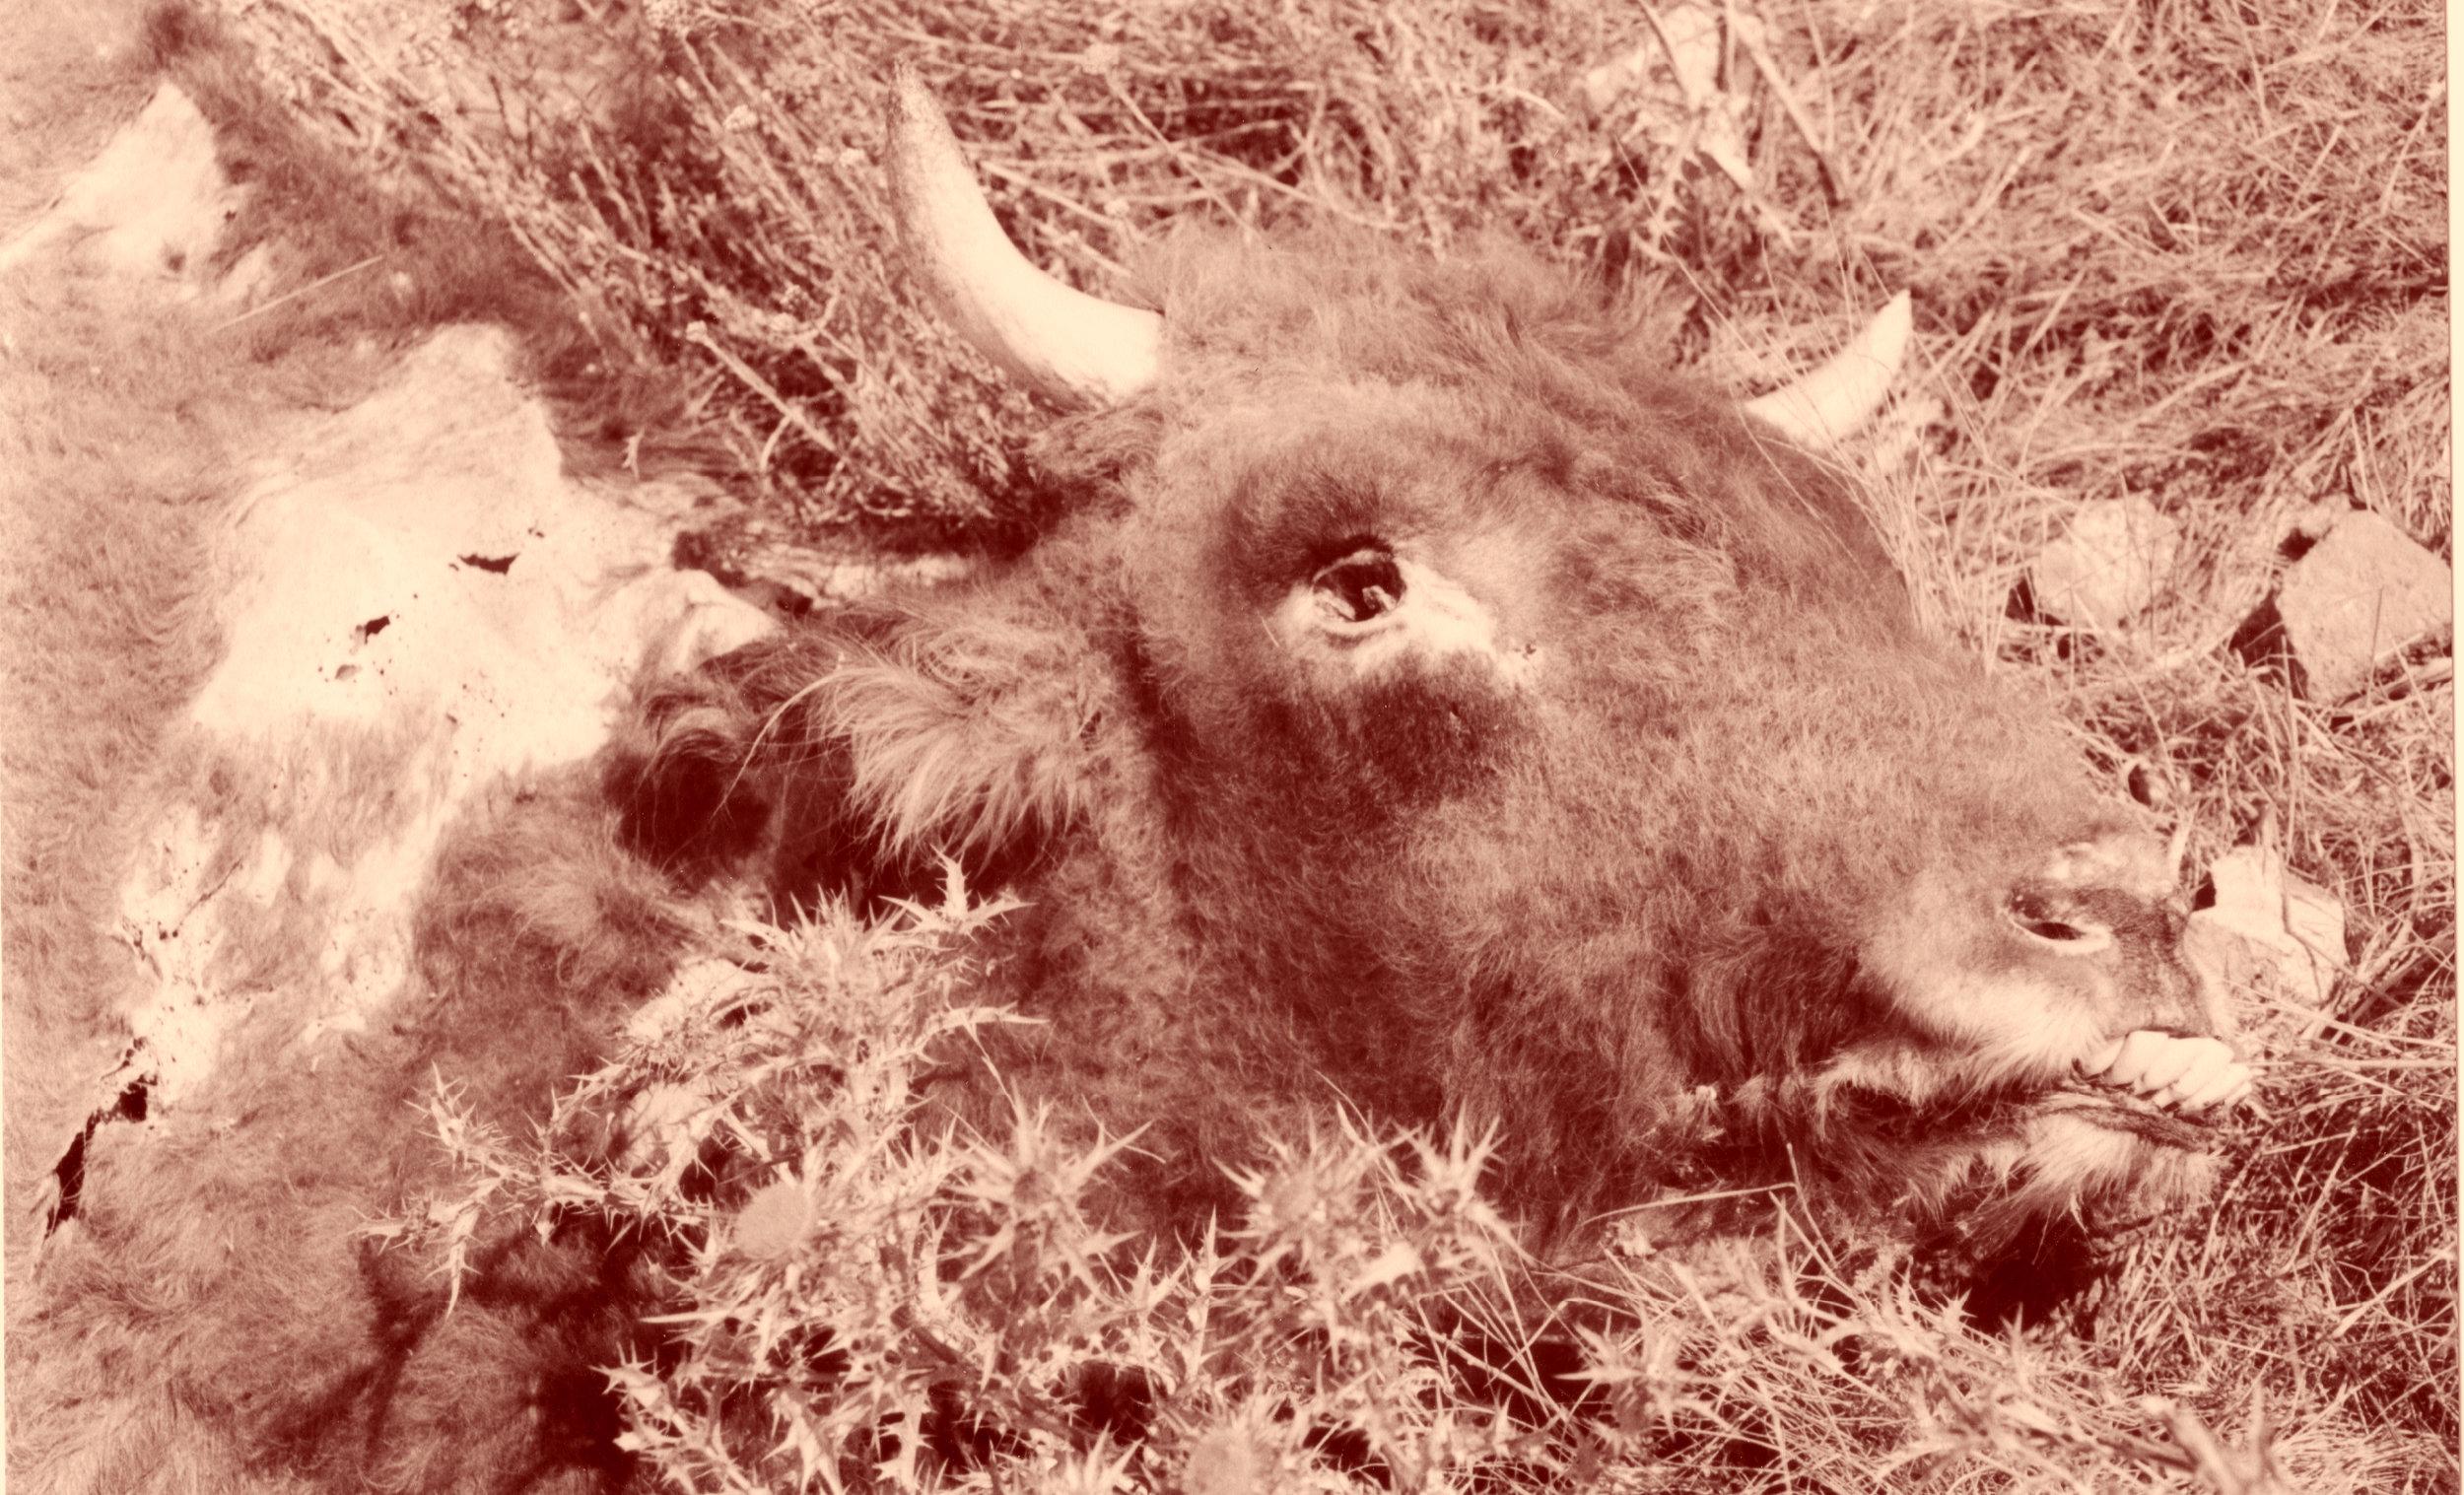 Momie de vache, en pleine nature.